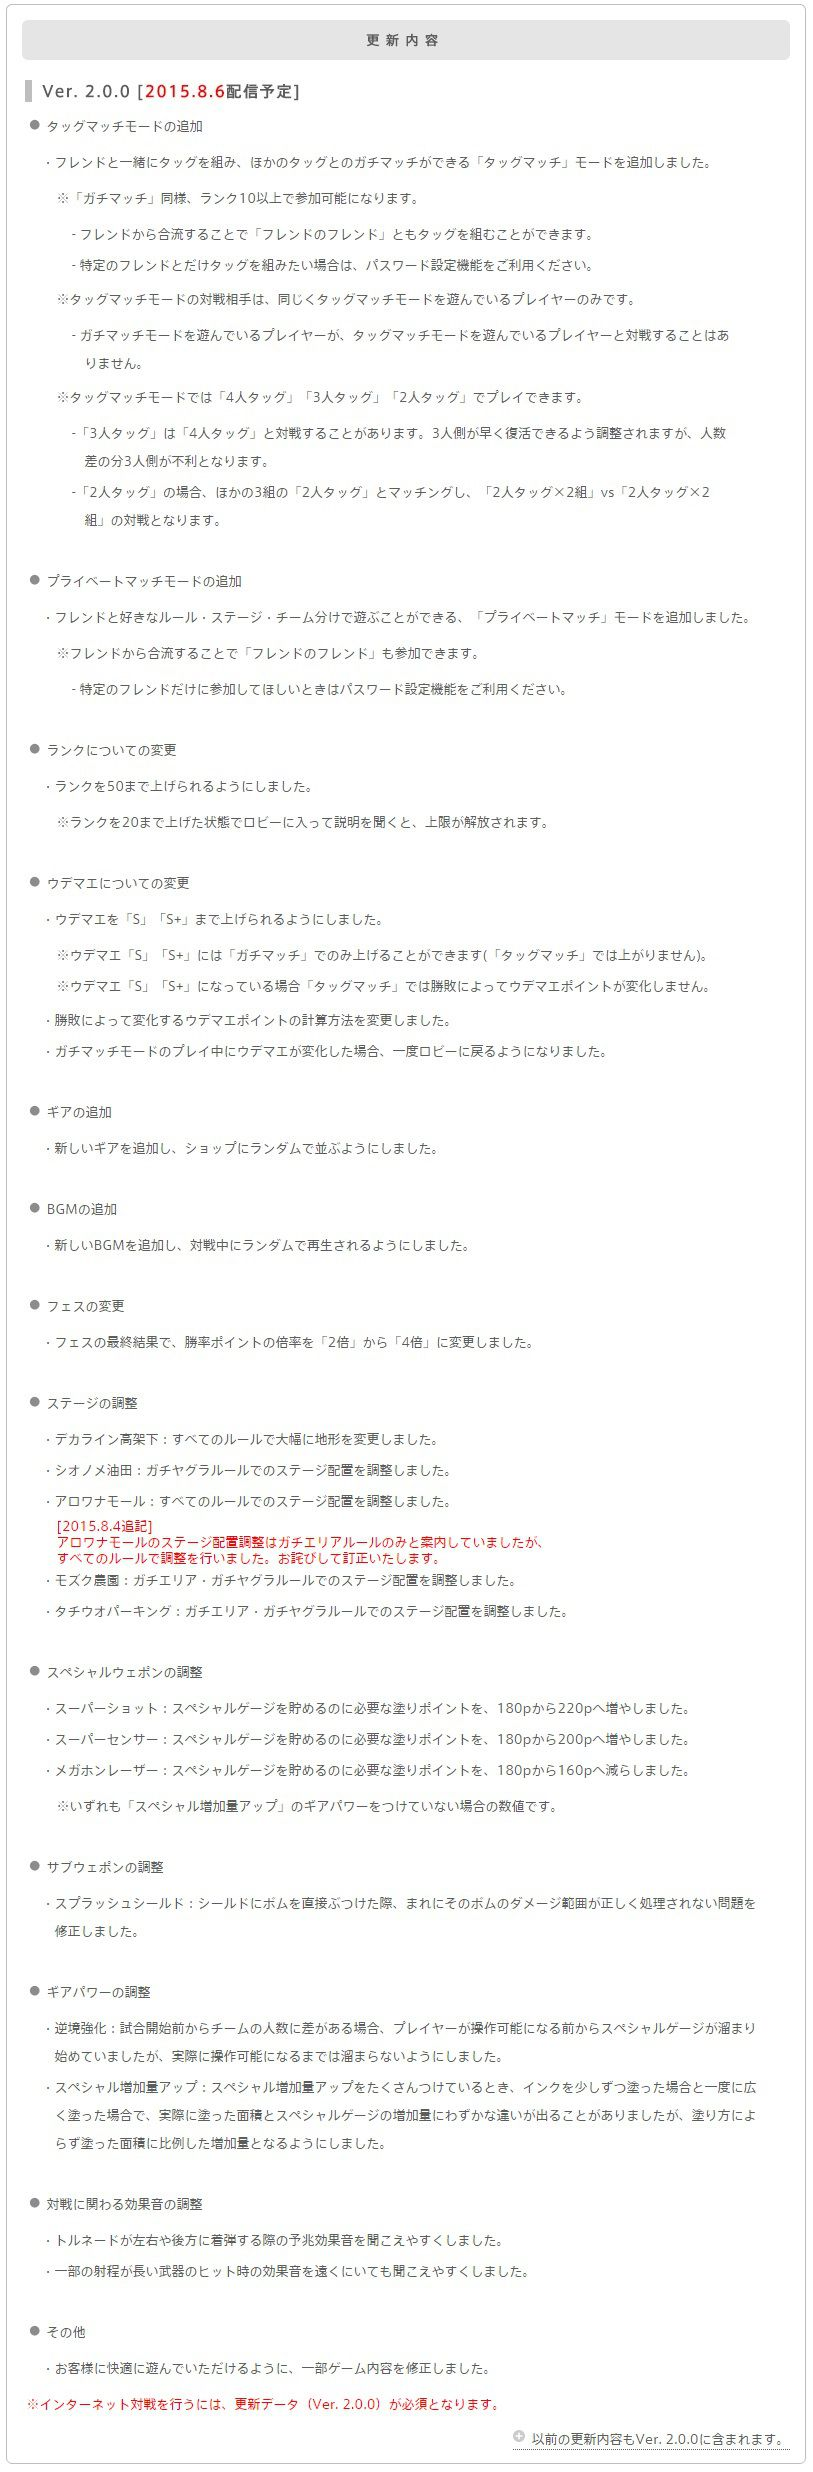 image_2659.jpg